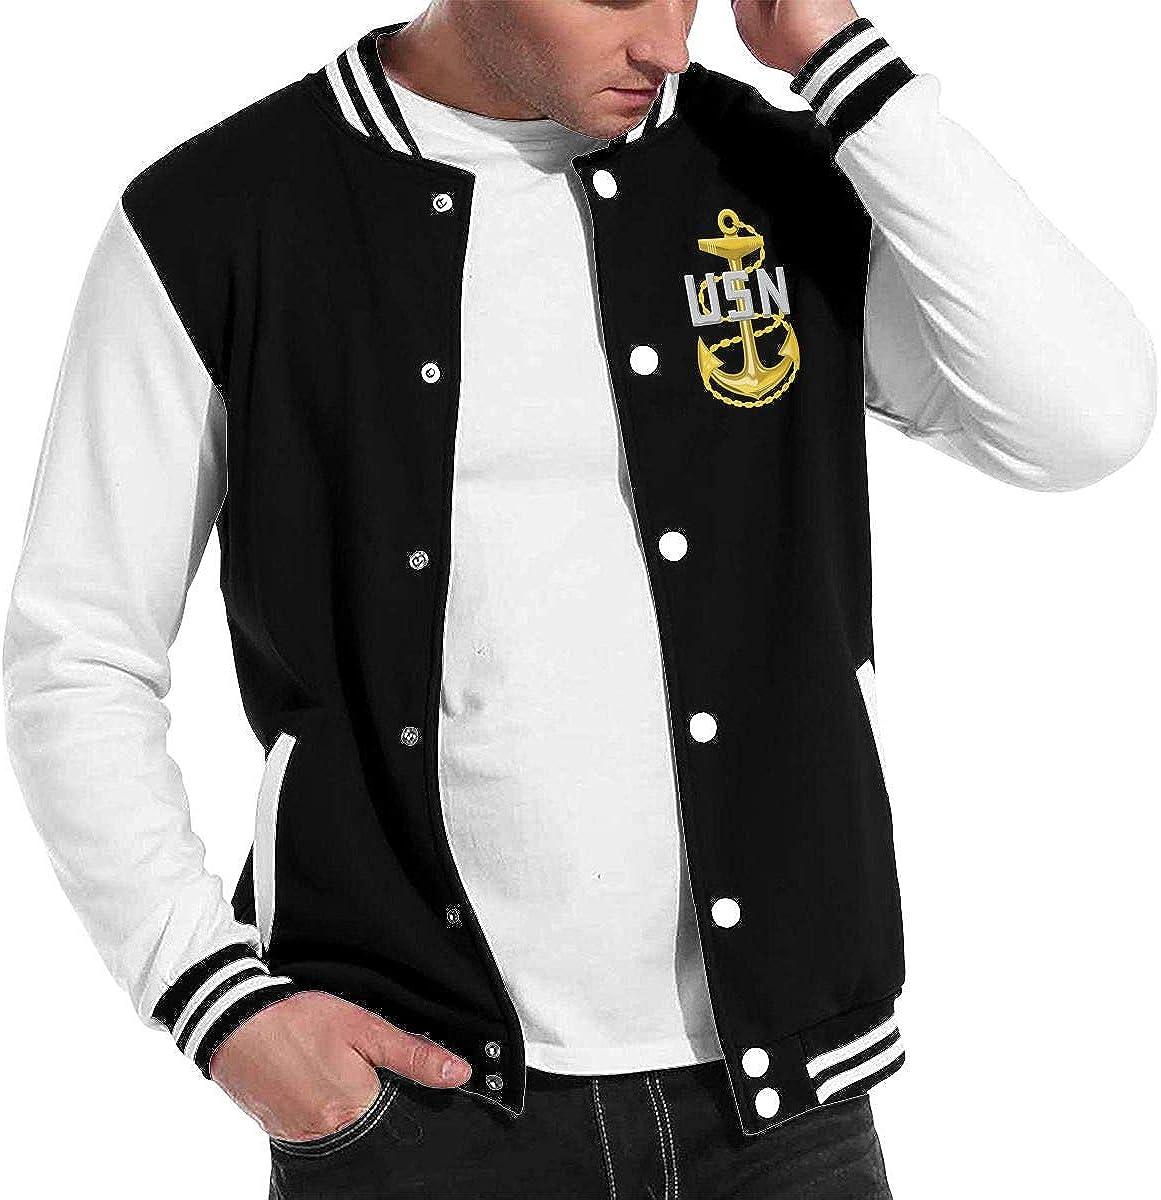 Fire Rescue Sign Baseball Uniform Jacket Sport Coat